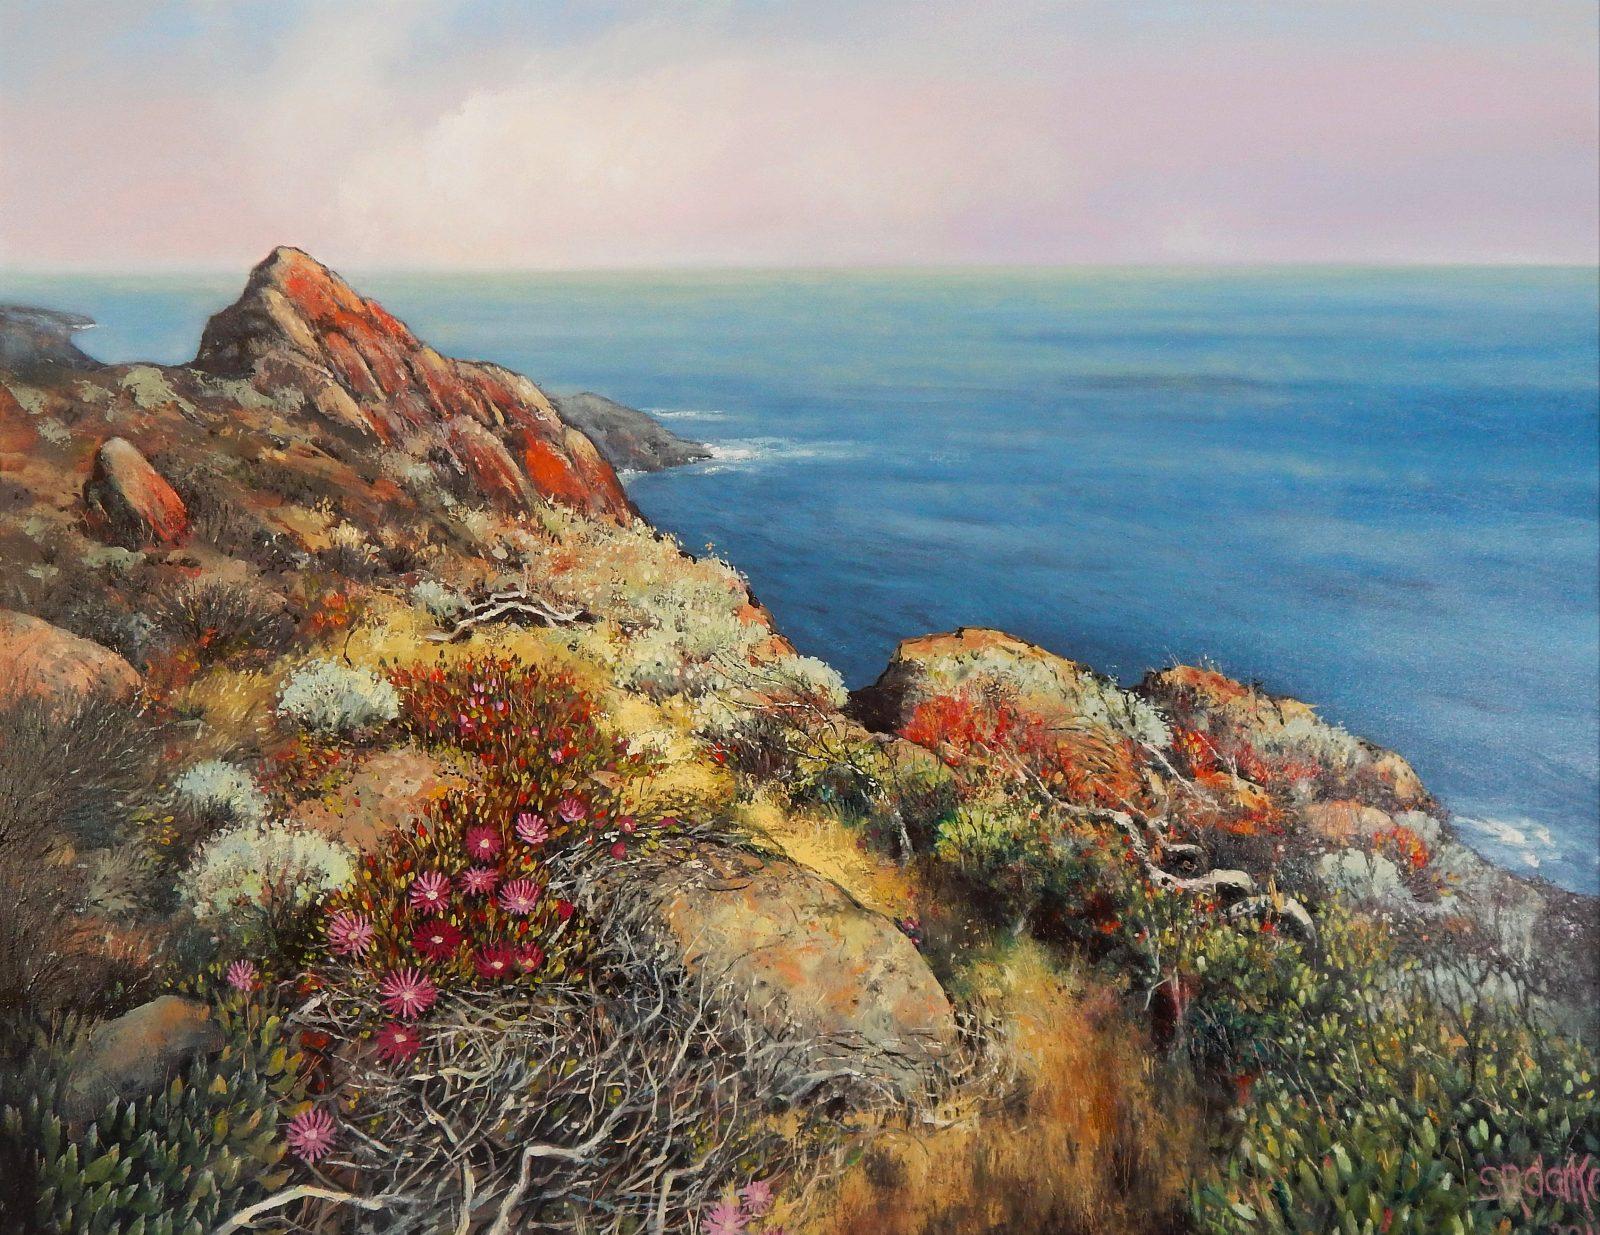 Metropolis Gallery - Stella Clarke 'Wildflowers High Over Blue' oil on canvas 2019 Size: 120 x 150cm